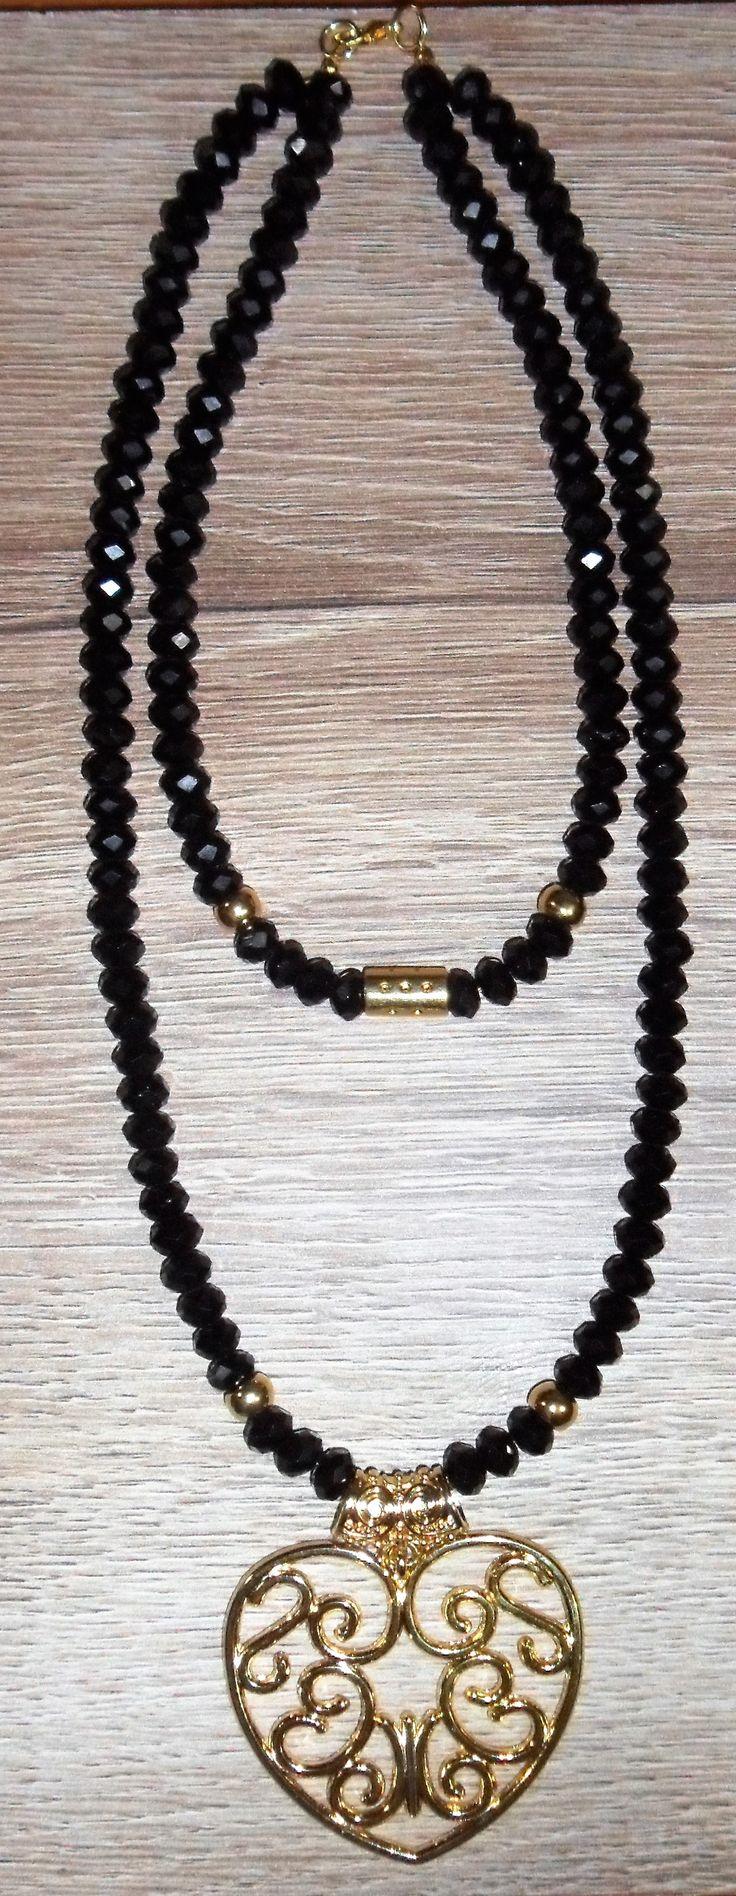 collar negro doble en piedras de murano y dije en zamak